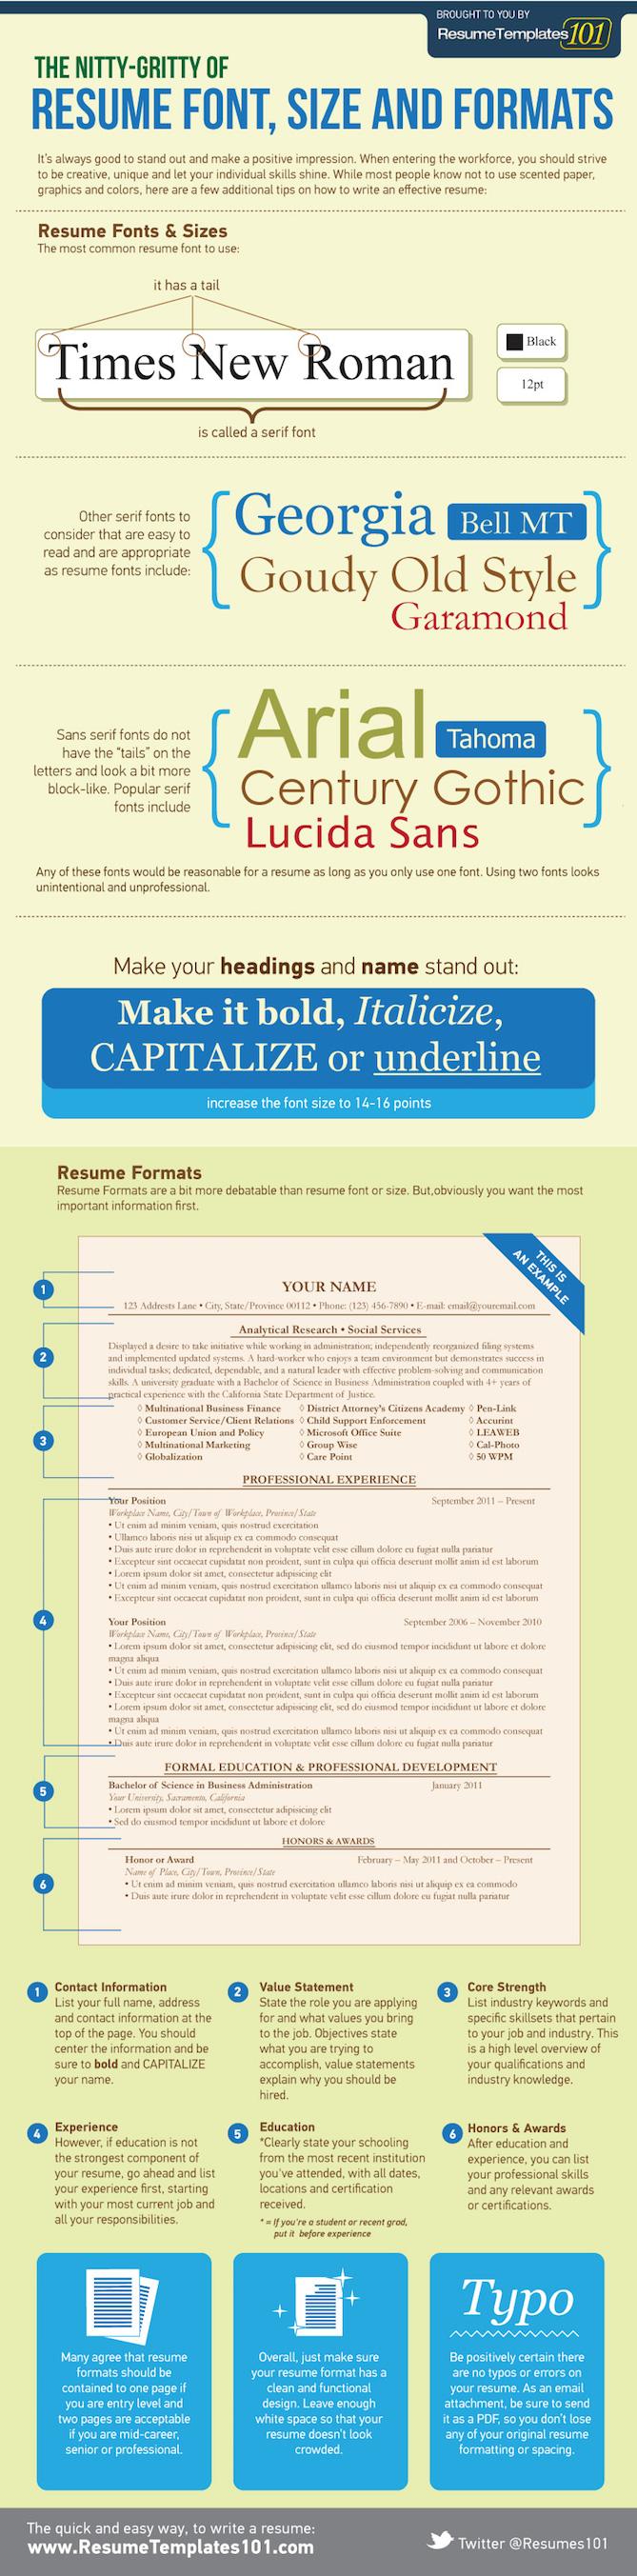 Resume Formats Infographic  Proper Resume Format